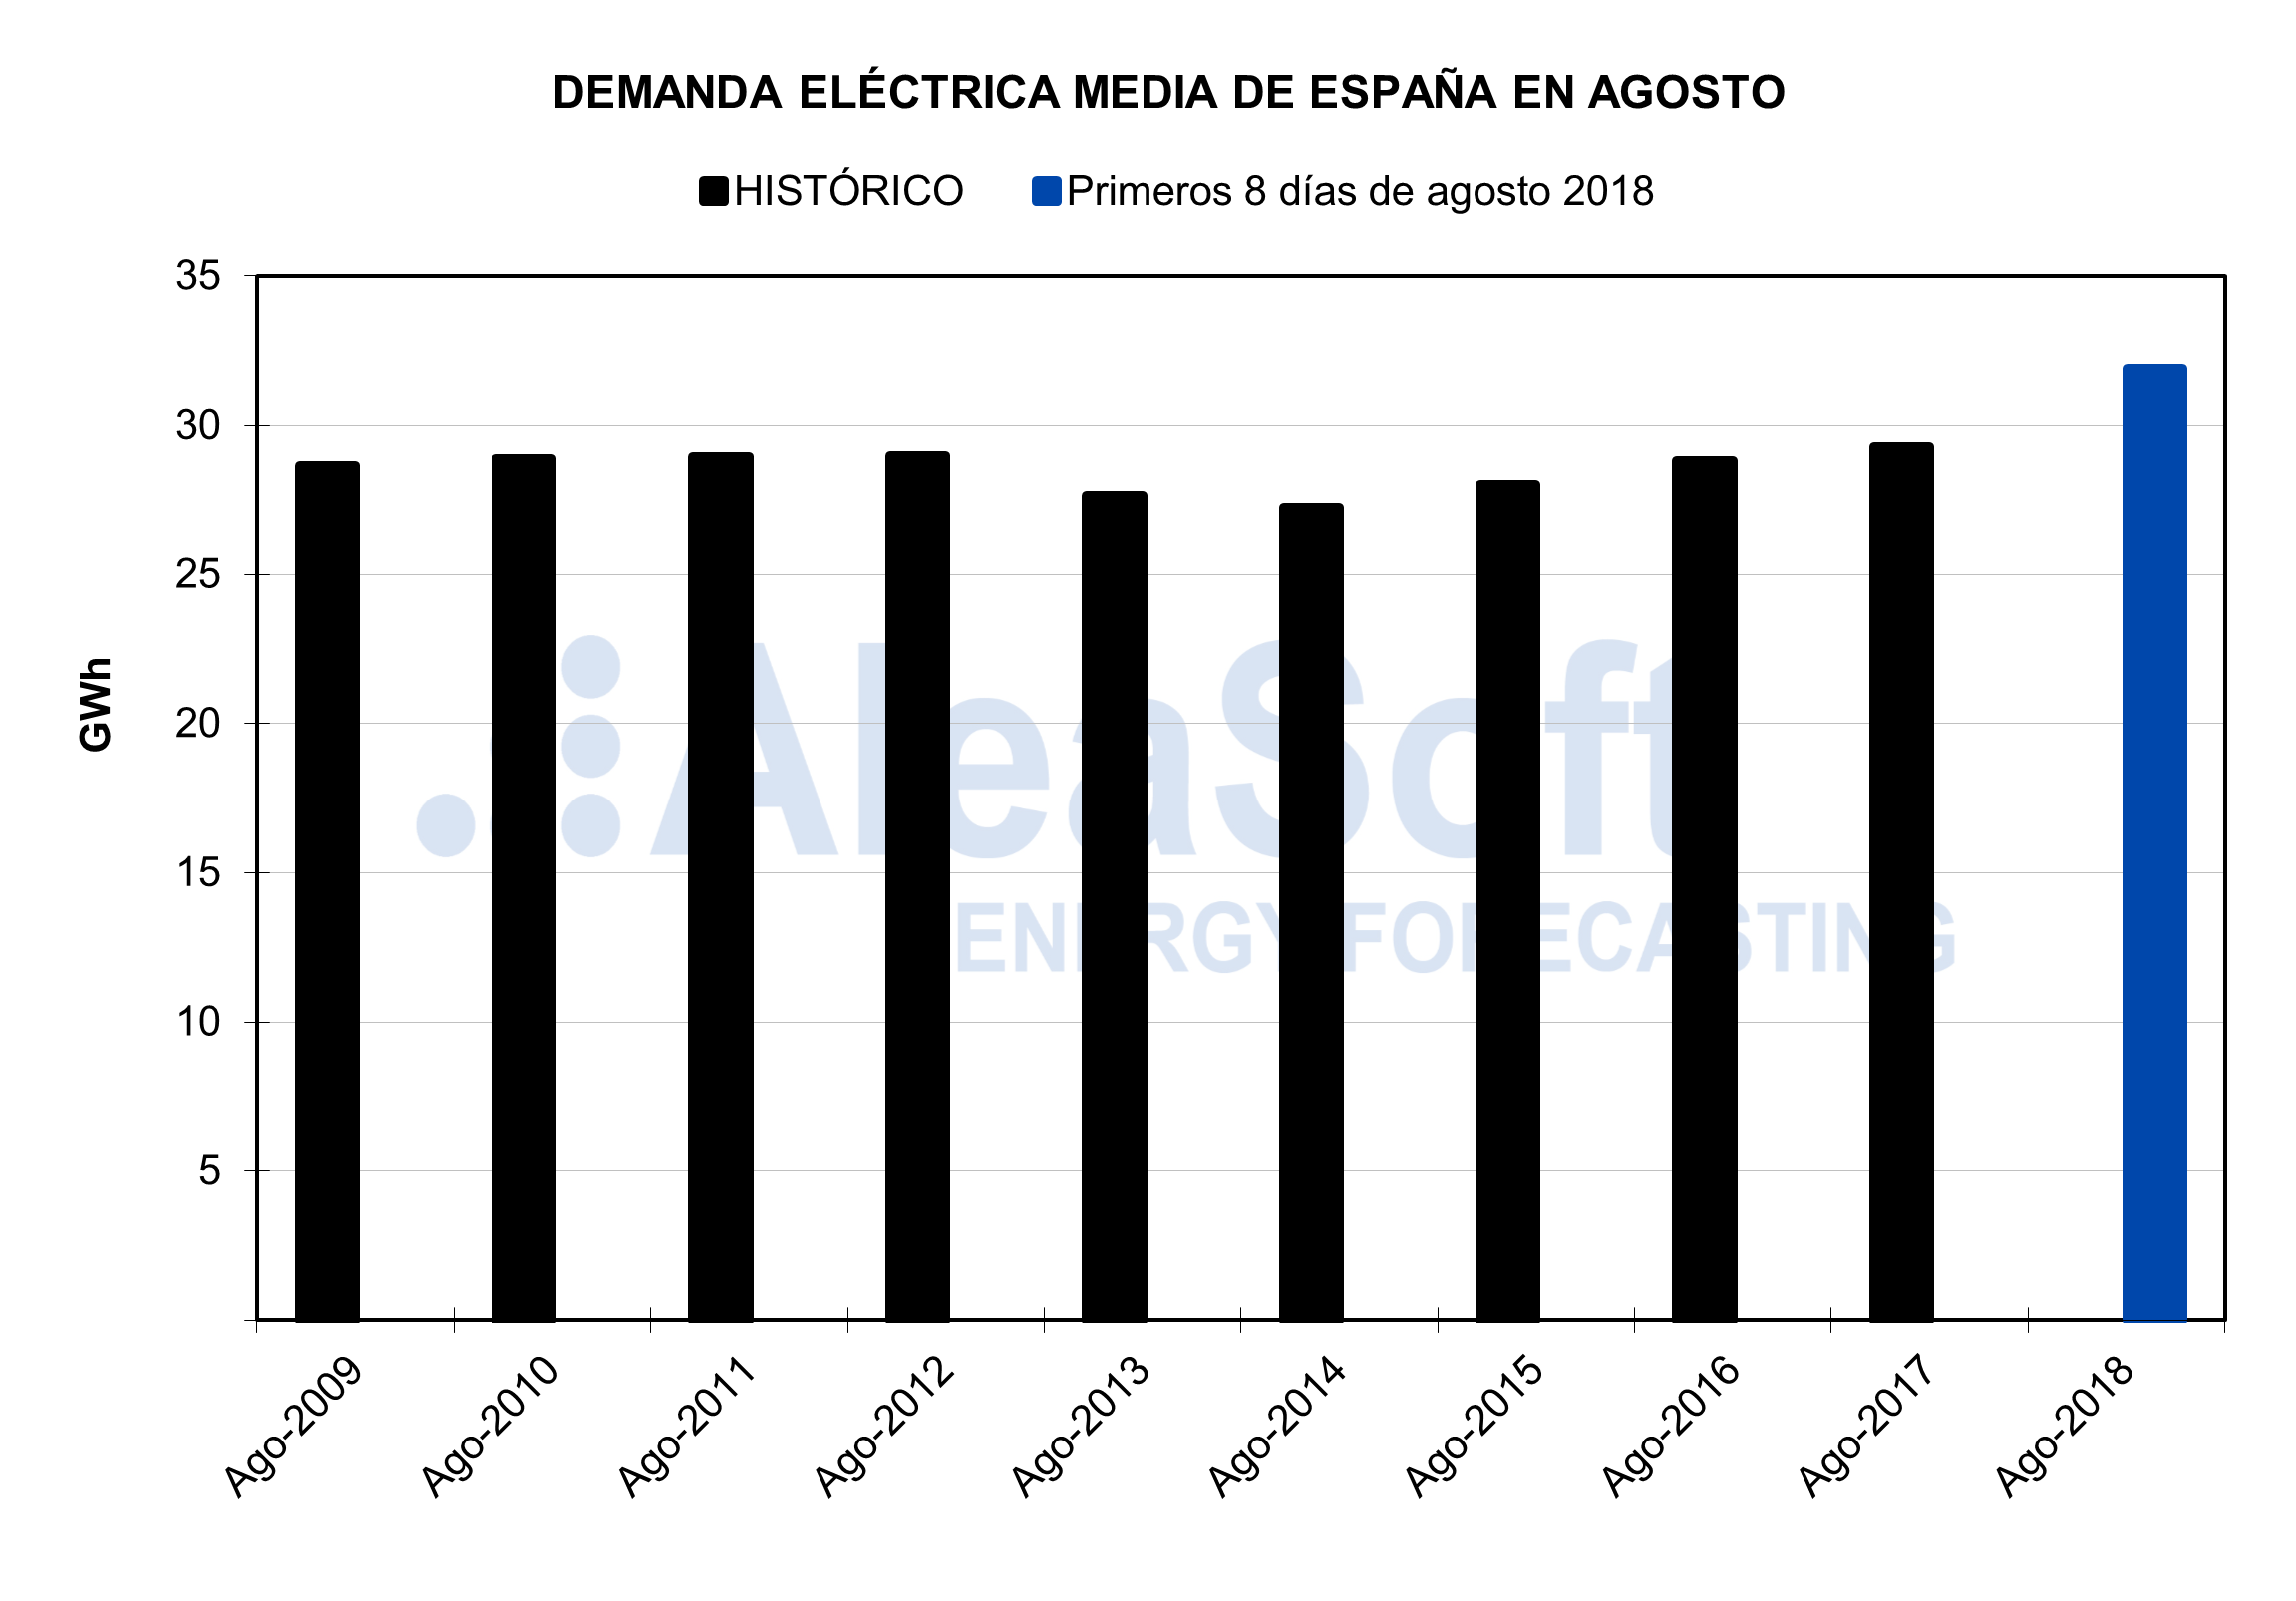 AleaSoft - Demanda electrica de España